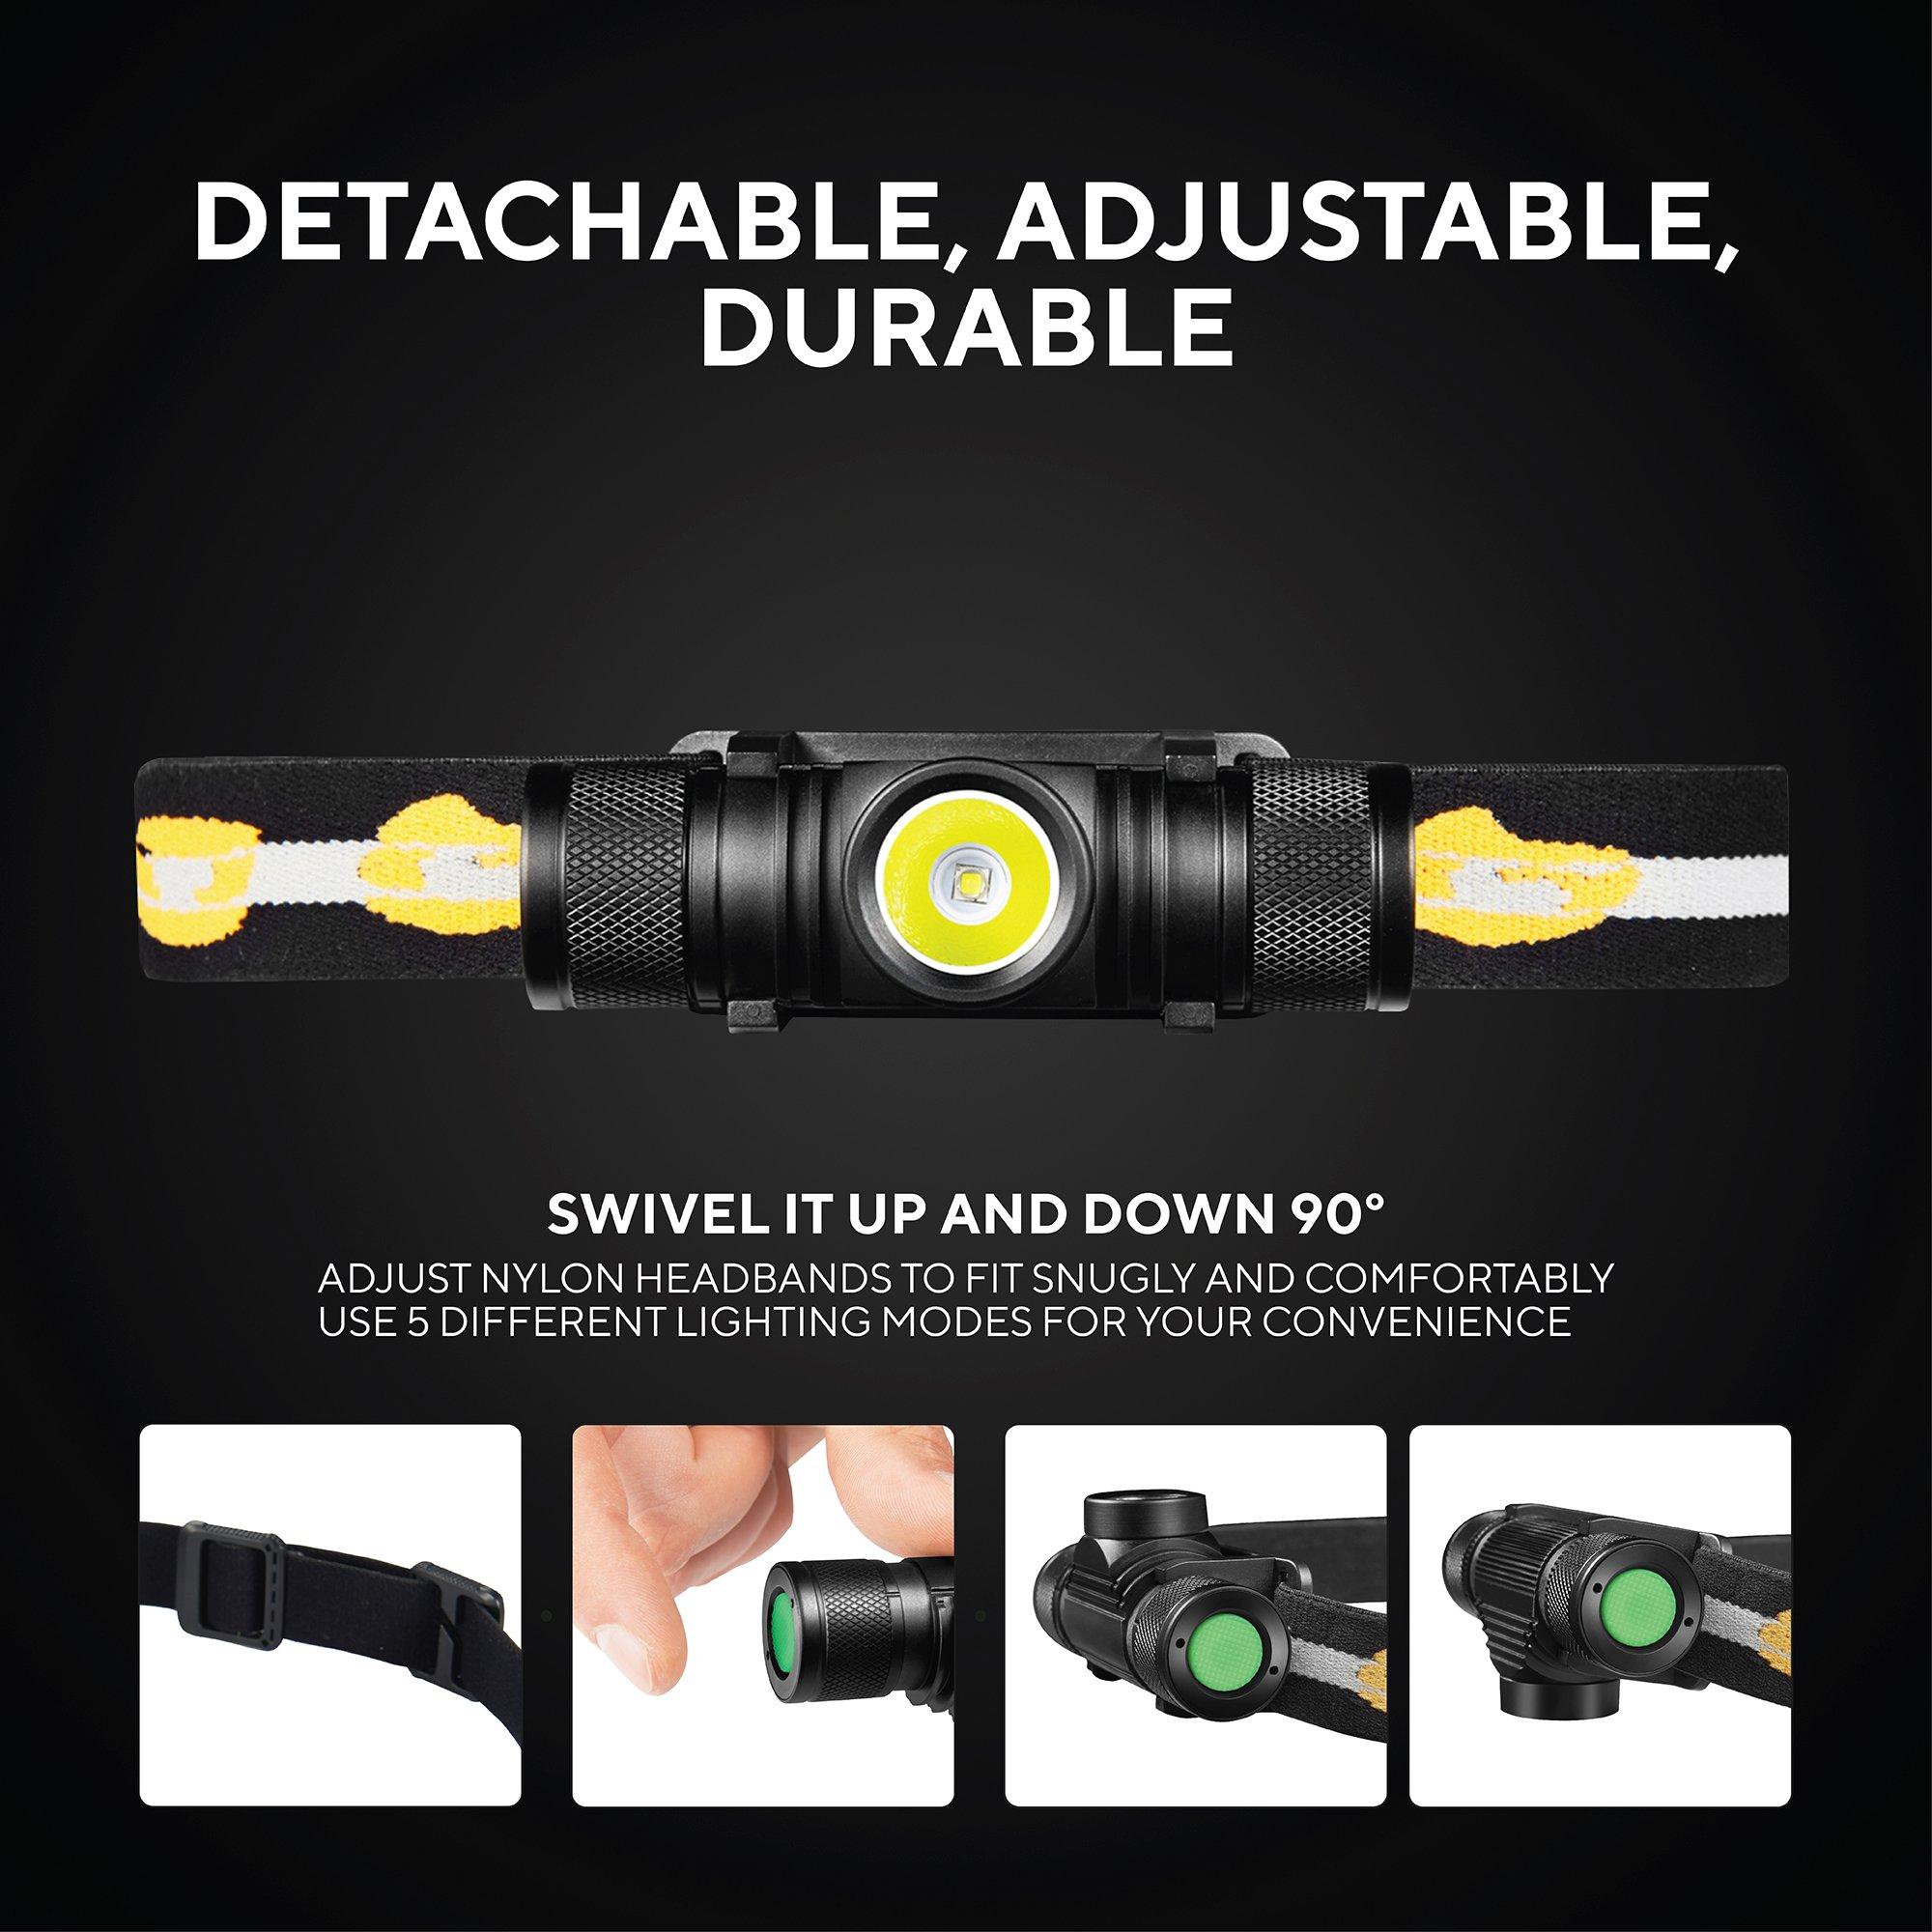 SLONIK - Adjustable beam - 500 Lumen Rechargeable LED Headlamp 2200 mAh Battery - Lightweight, Durable, Waterproof and Dustproof Headlight - Amazing 220-yards Beam - Great as Camping and Hiking Gear by SLONIK (Image #7)